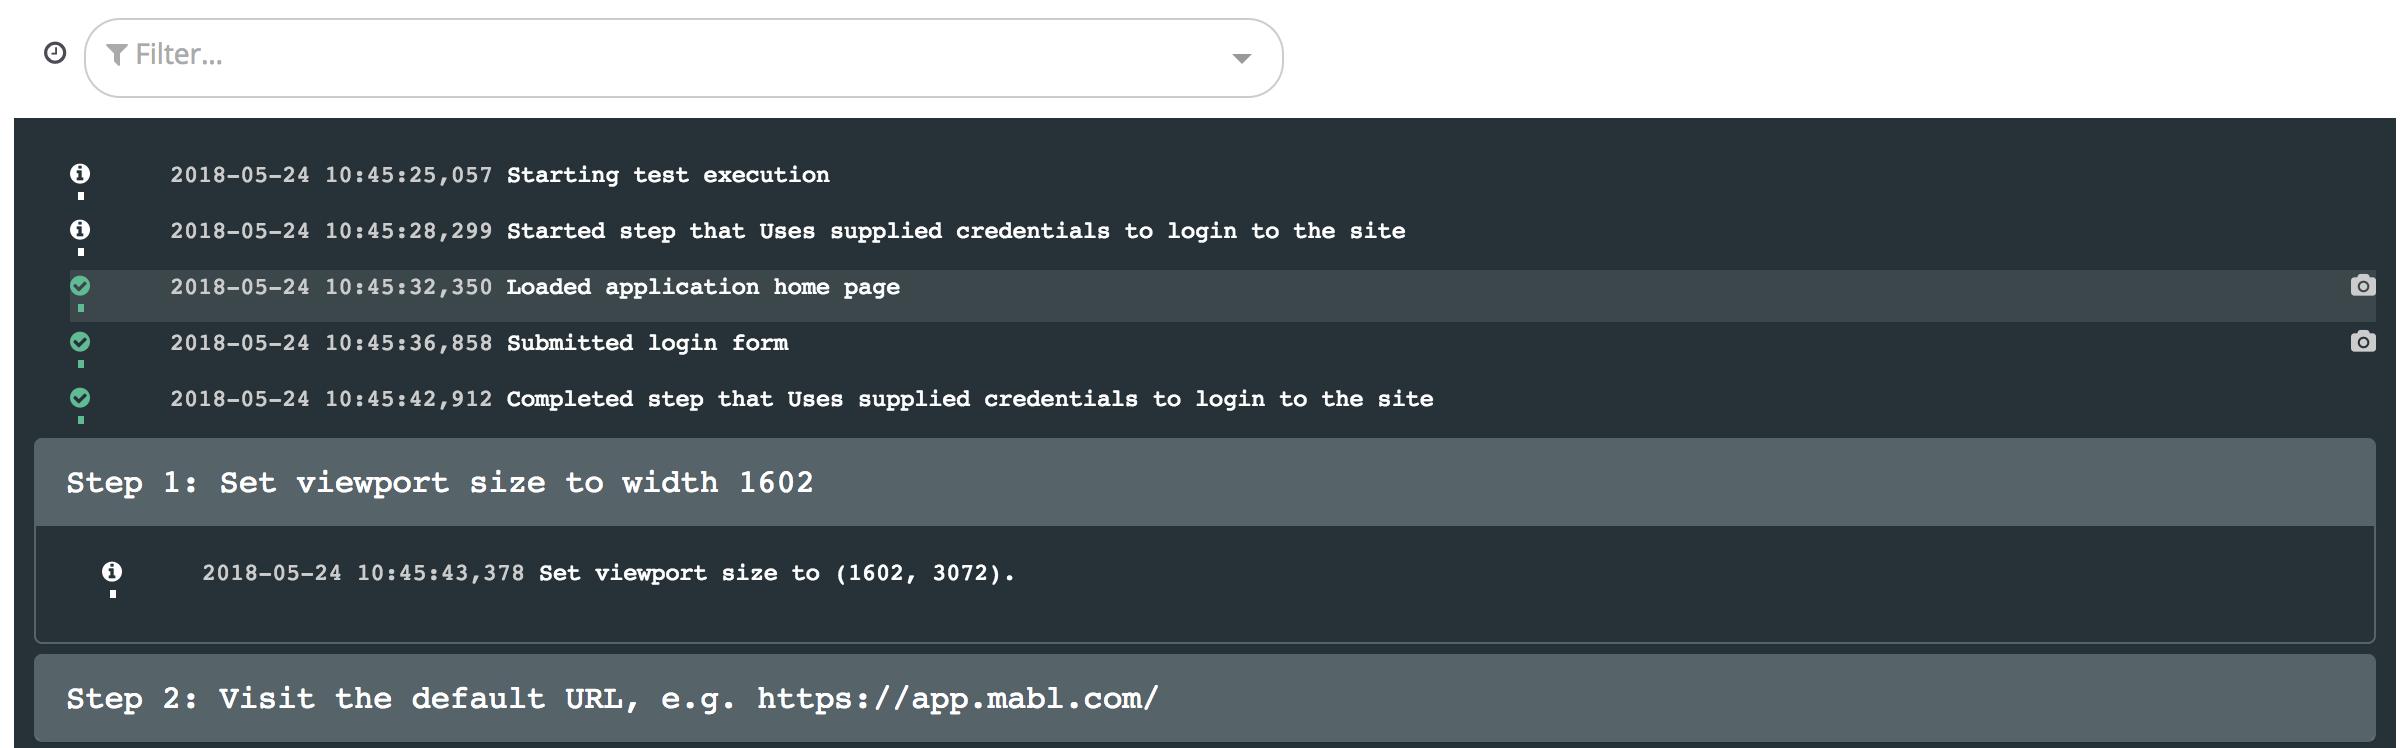 An example of an unfiltered journey run output log.